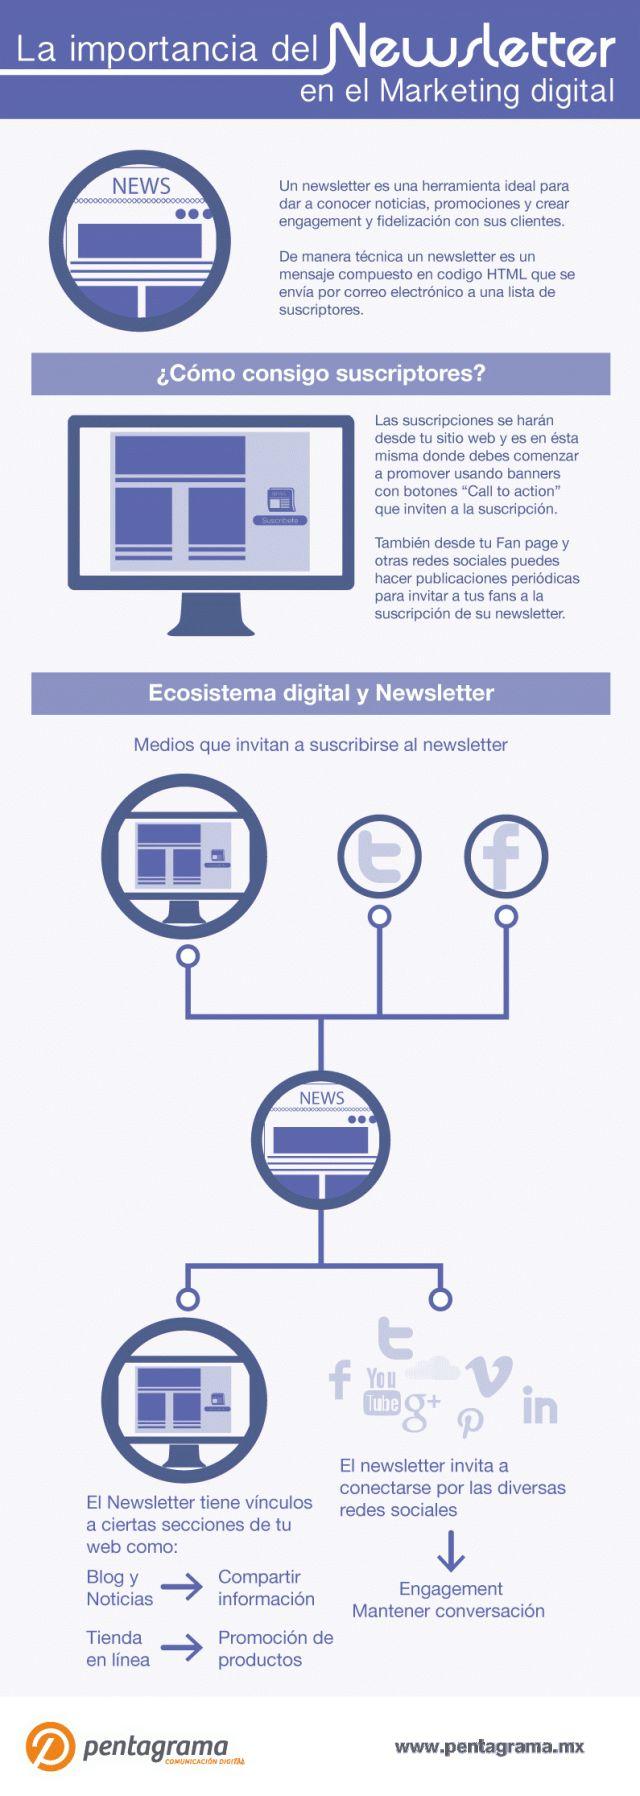 La importancia del Newsletter en el Marketing Digital #infografia #infographic #marketing